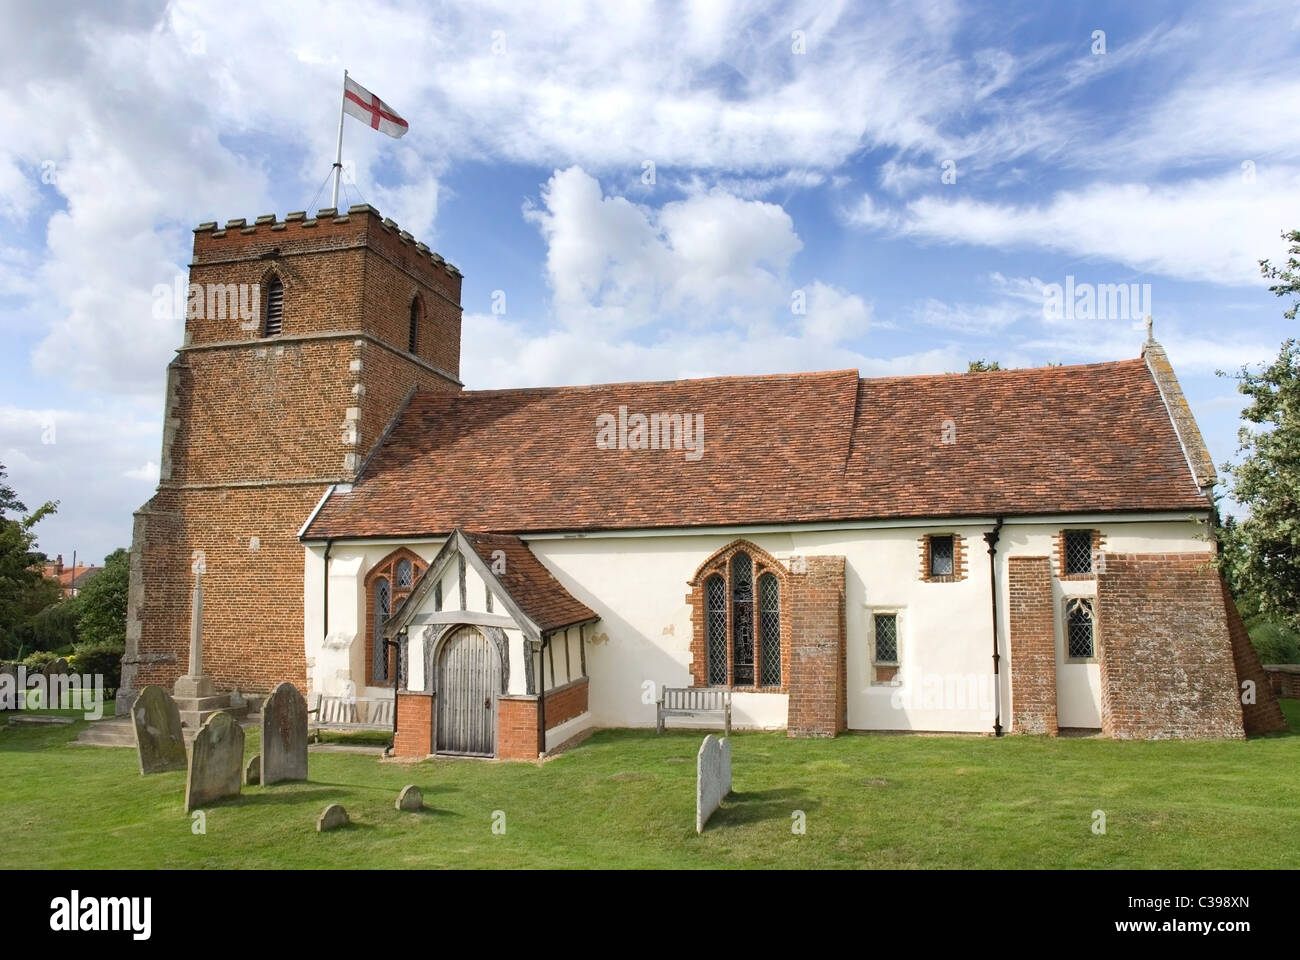 Village church, Levington, Suffolk, UK Stock Photo, Royalty Free ...